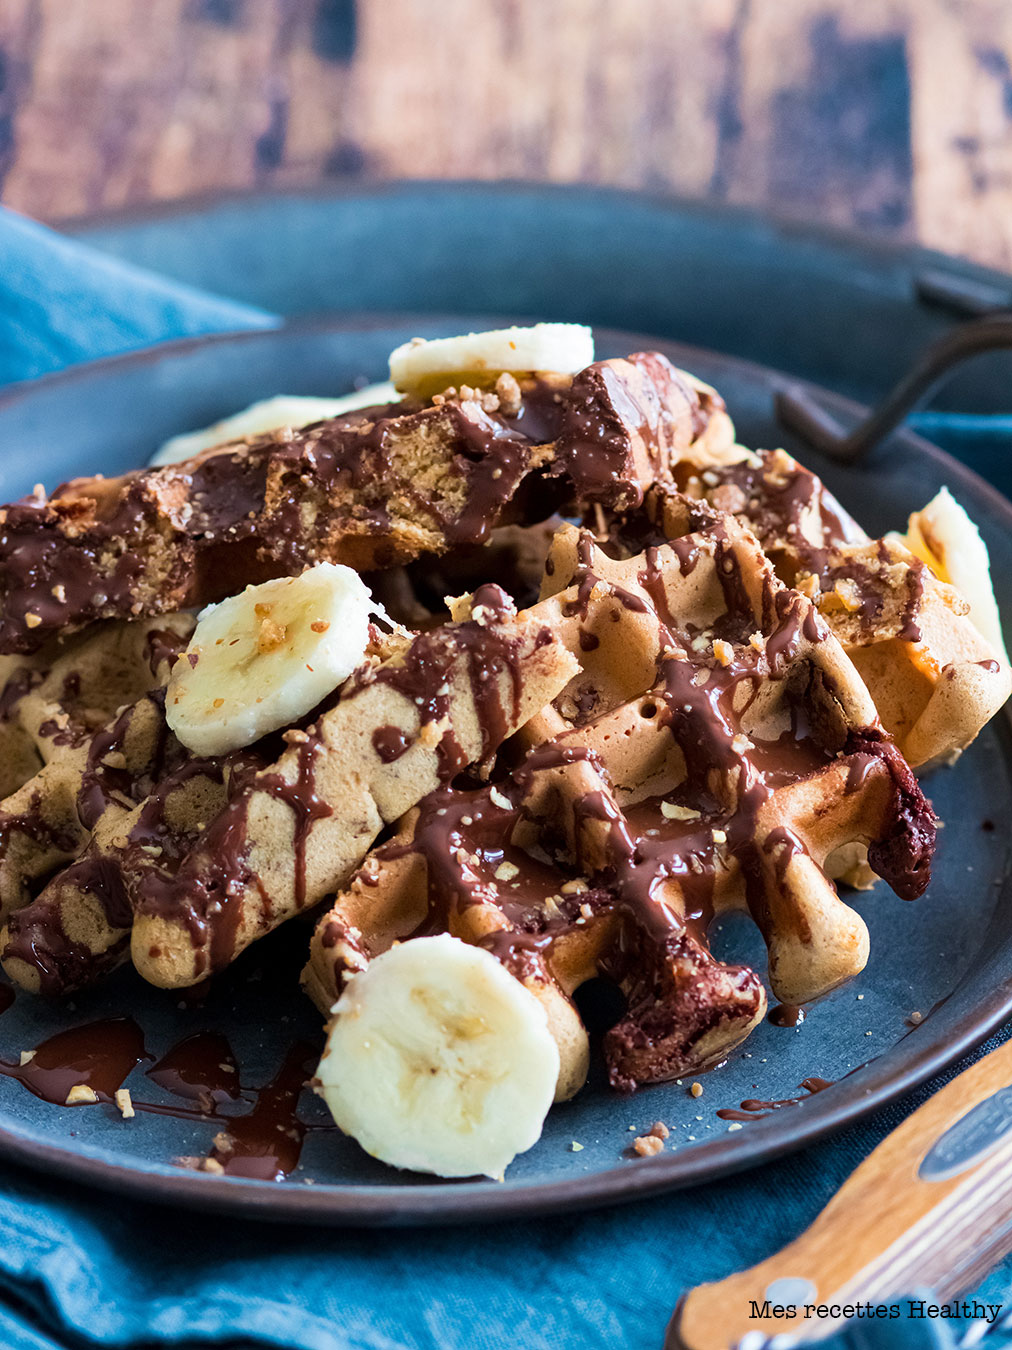 recette healthy-gaufre-chocolat-amande-sans beurre